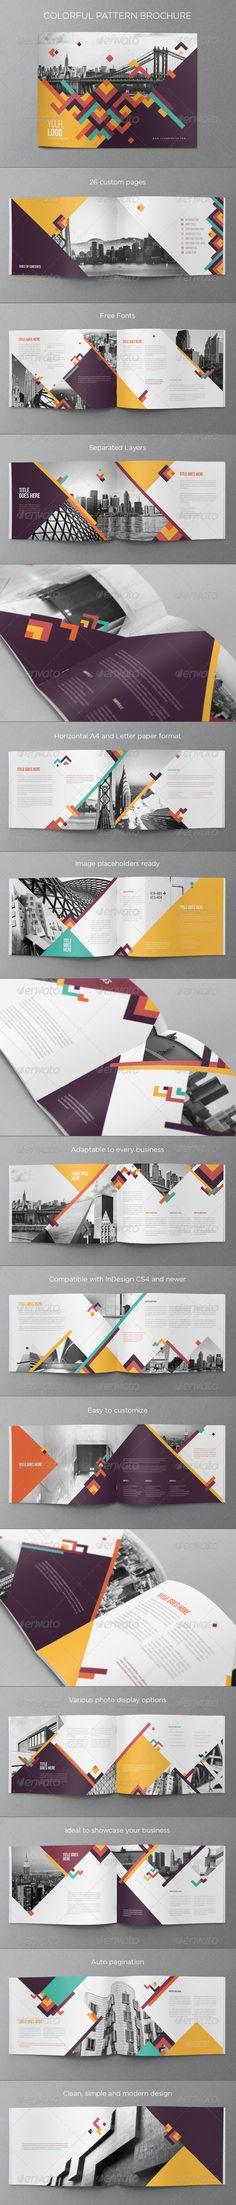 Colorful Pattern Brochure - Brochures Print Templates